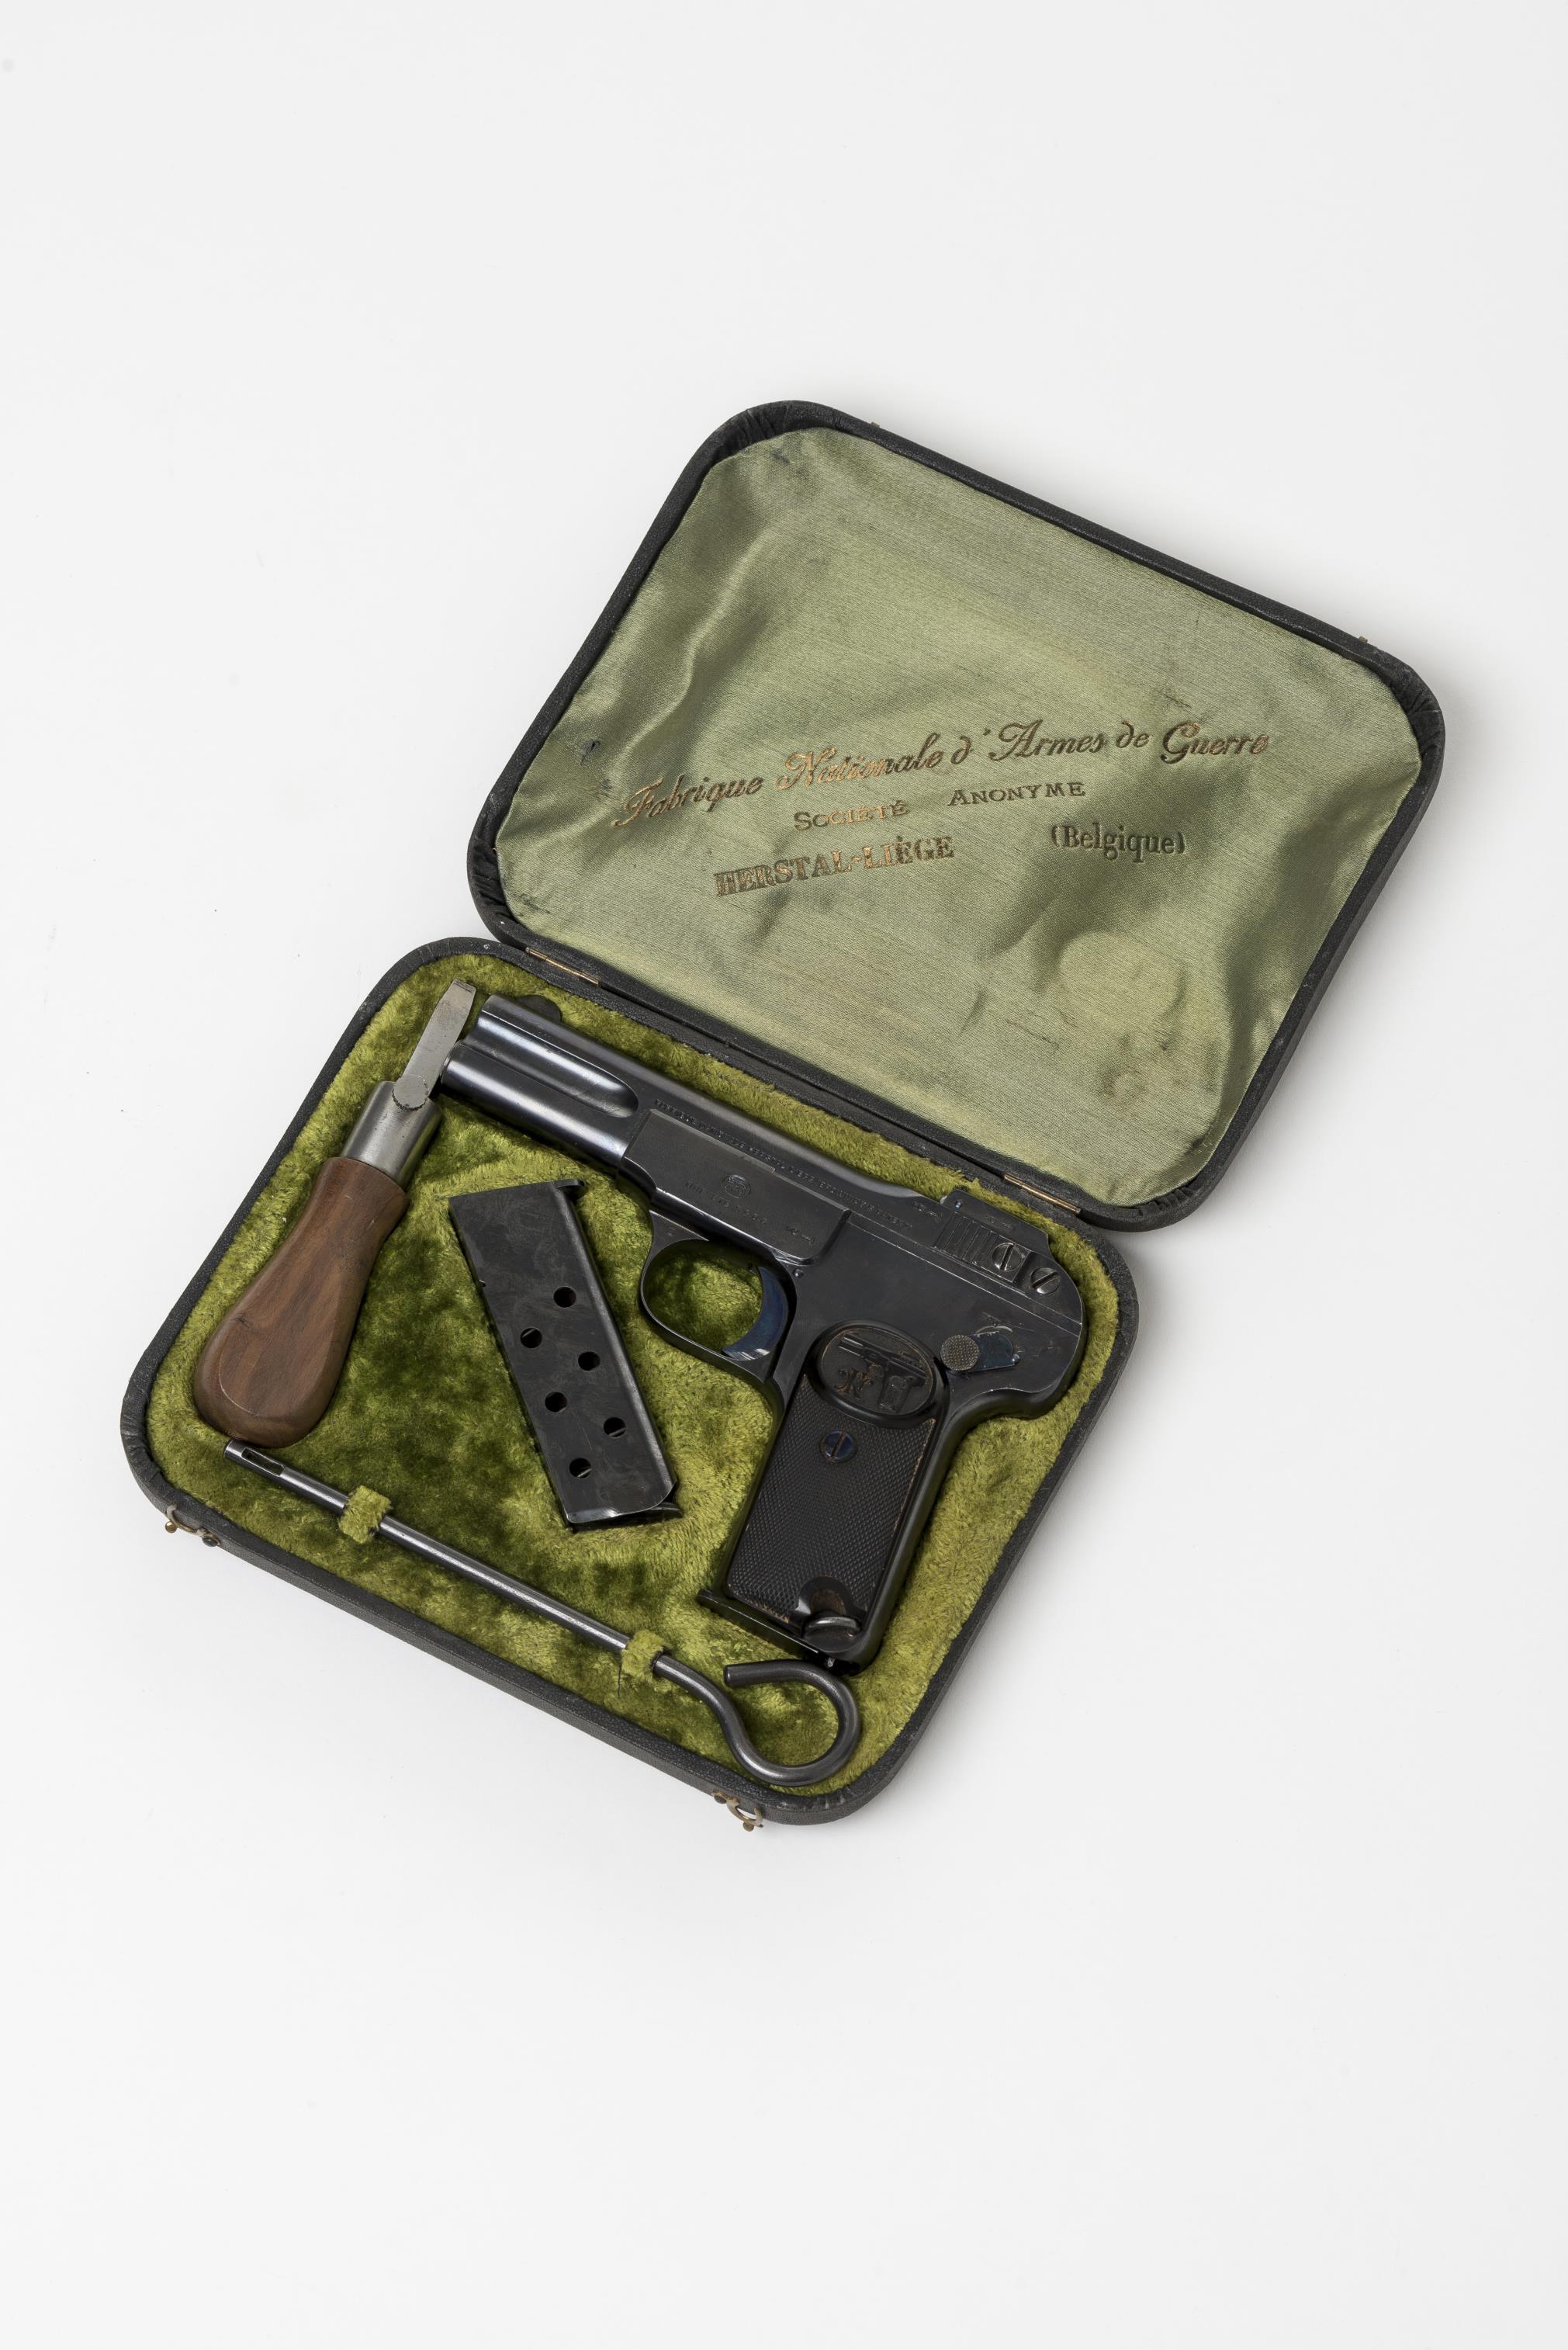 FN Browning type 1900 calibre 7 65 n°11312 dans son écrin en